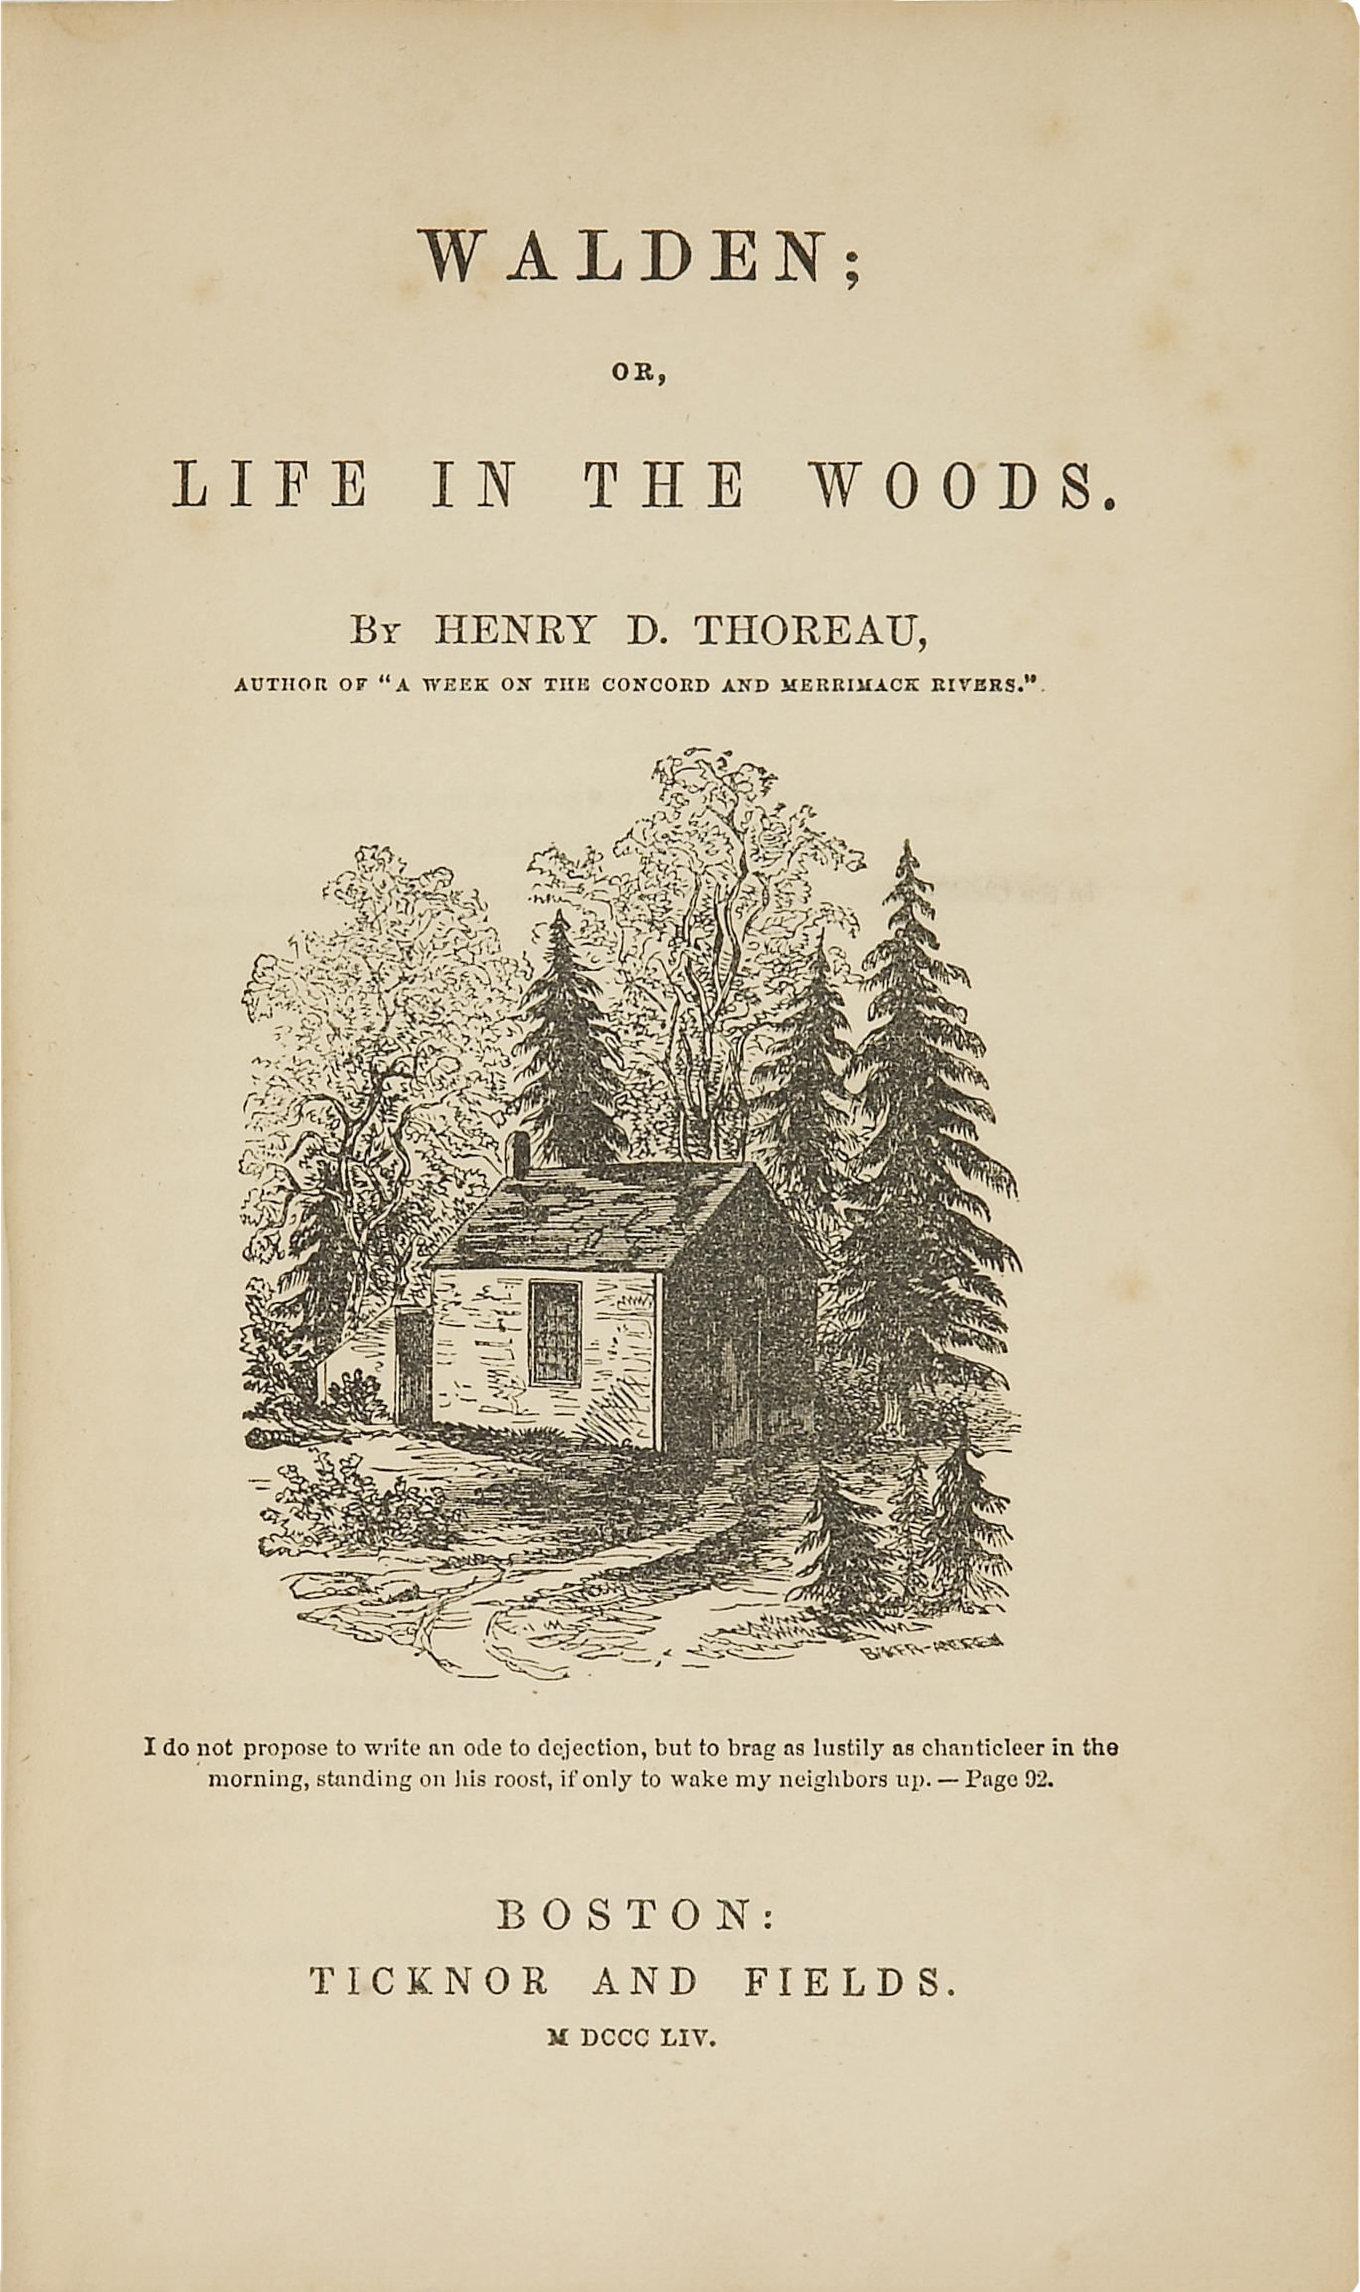 Thoreau's Walden (1854)